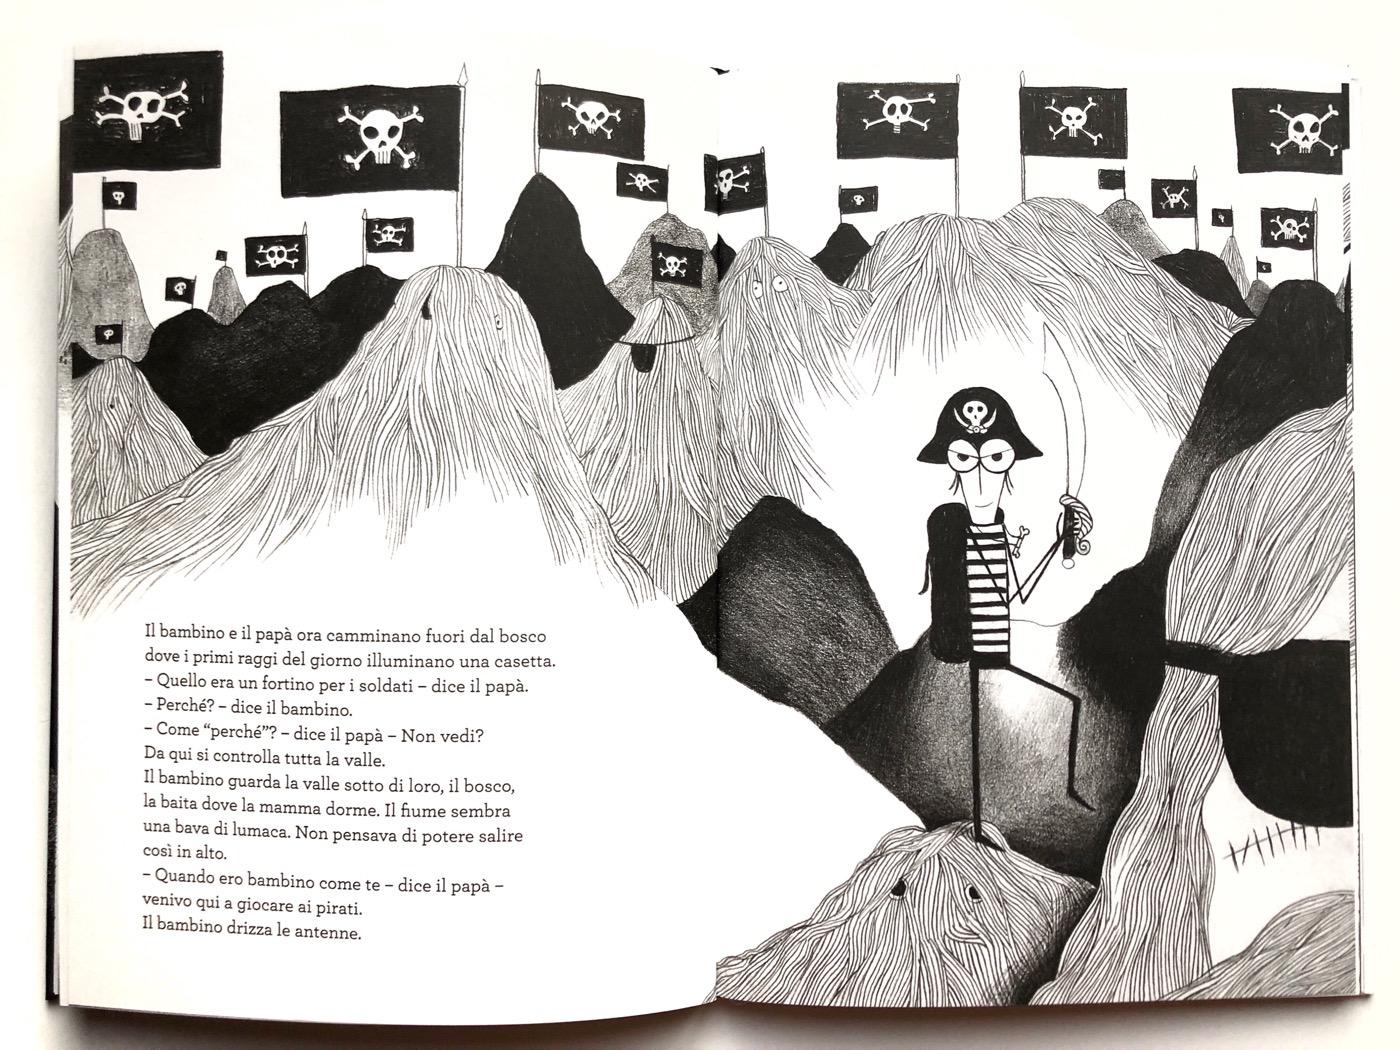 montagna-pirata-corraini-1